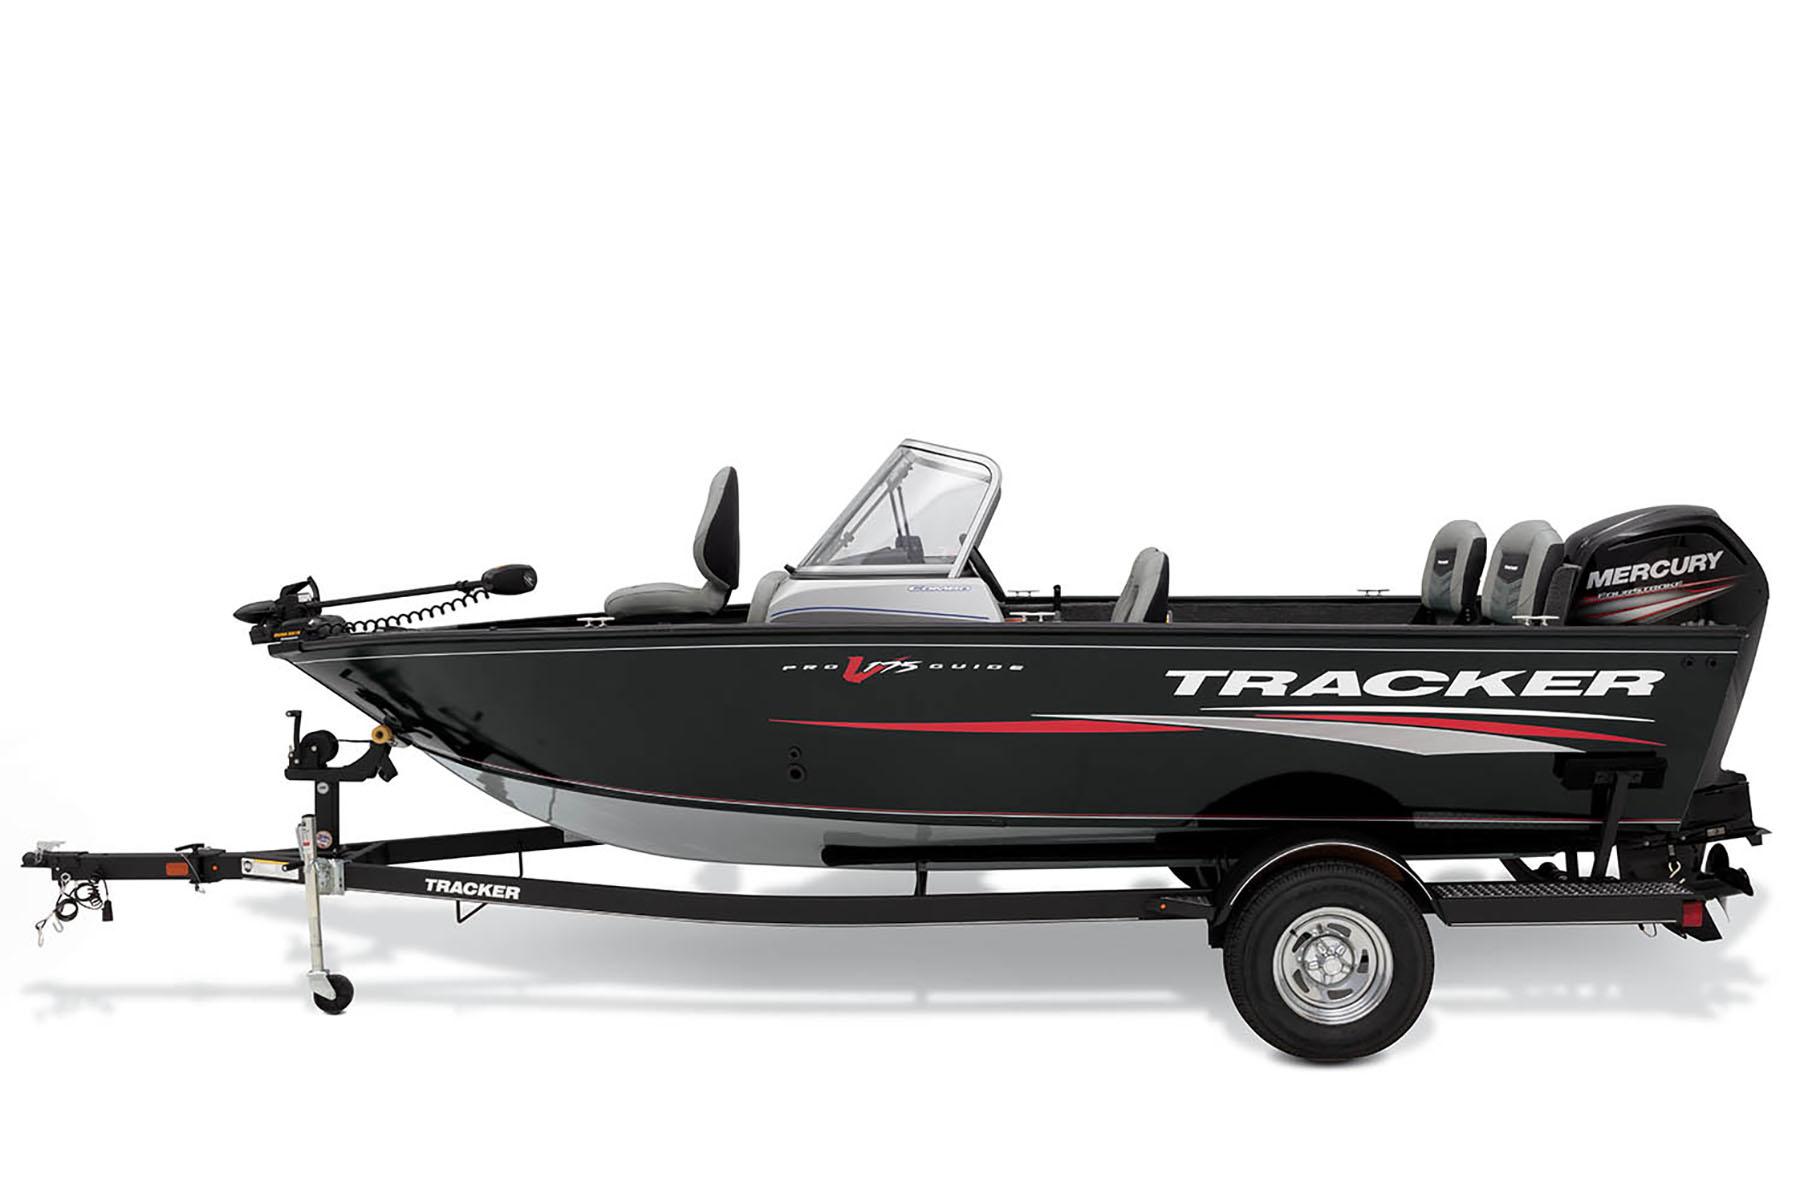 2019 Pro Guide V 175 Combo Tracker Deep V Multi Species Boat